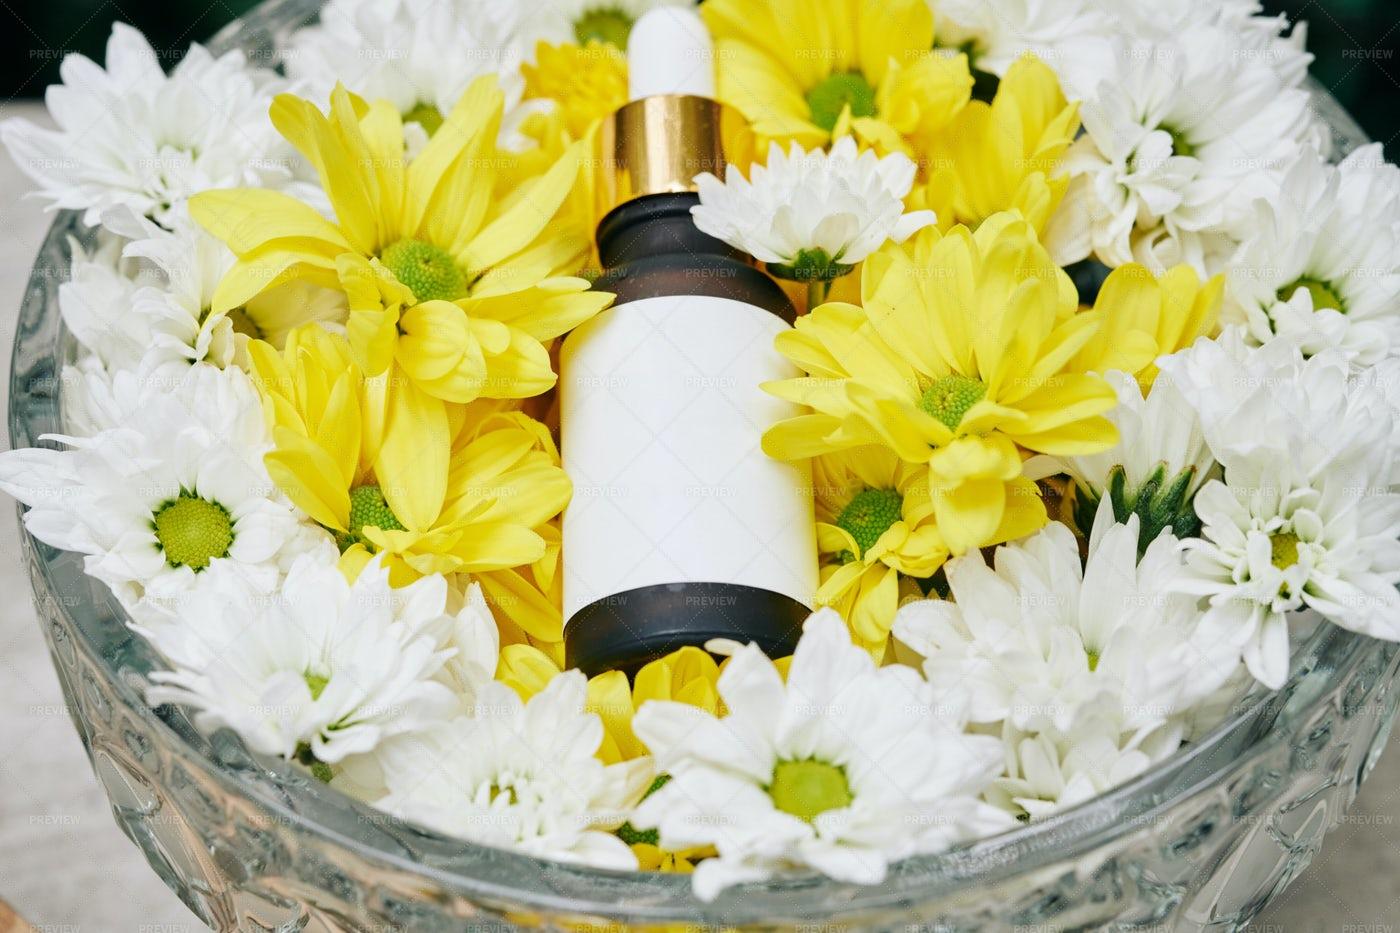 Expensive Rejuvenating Serum: Stock Photos